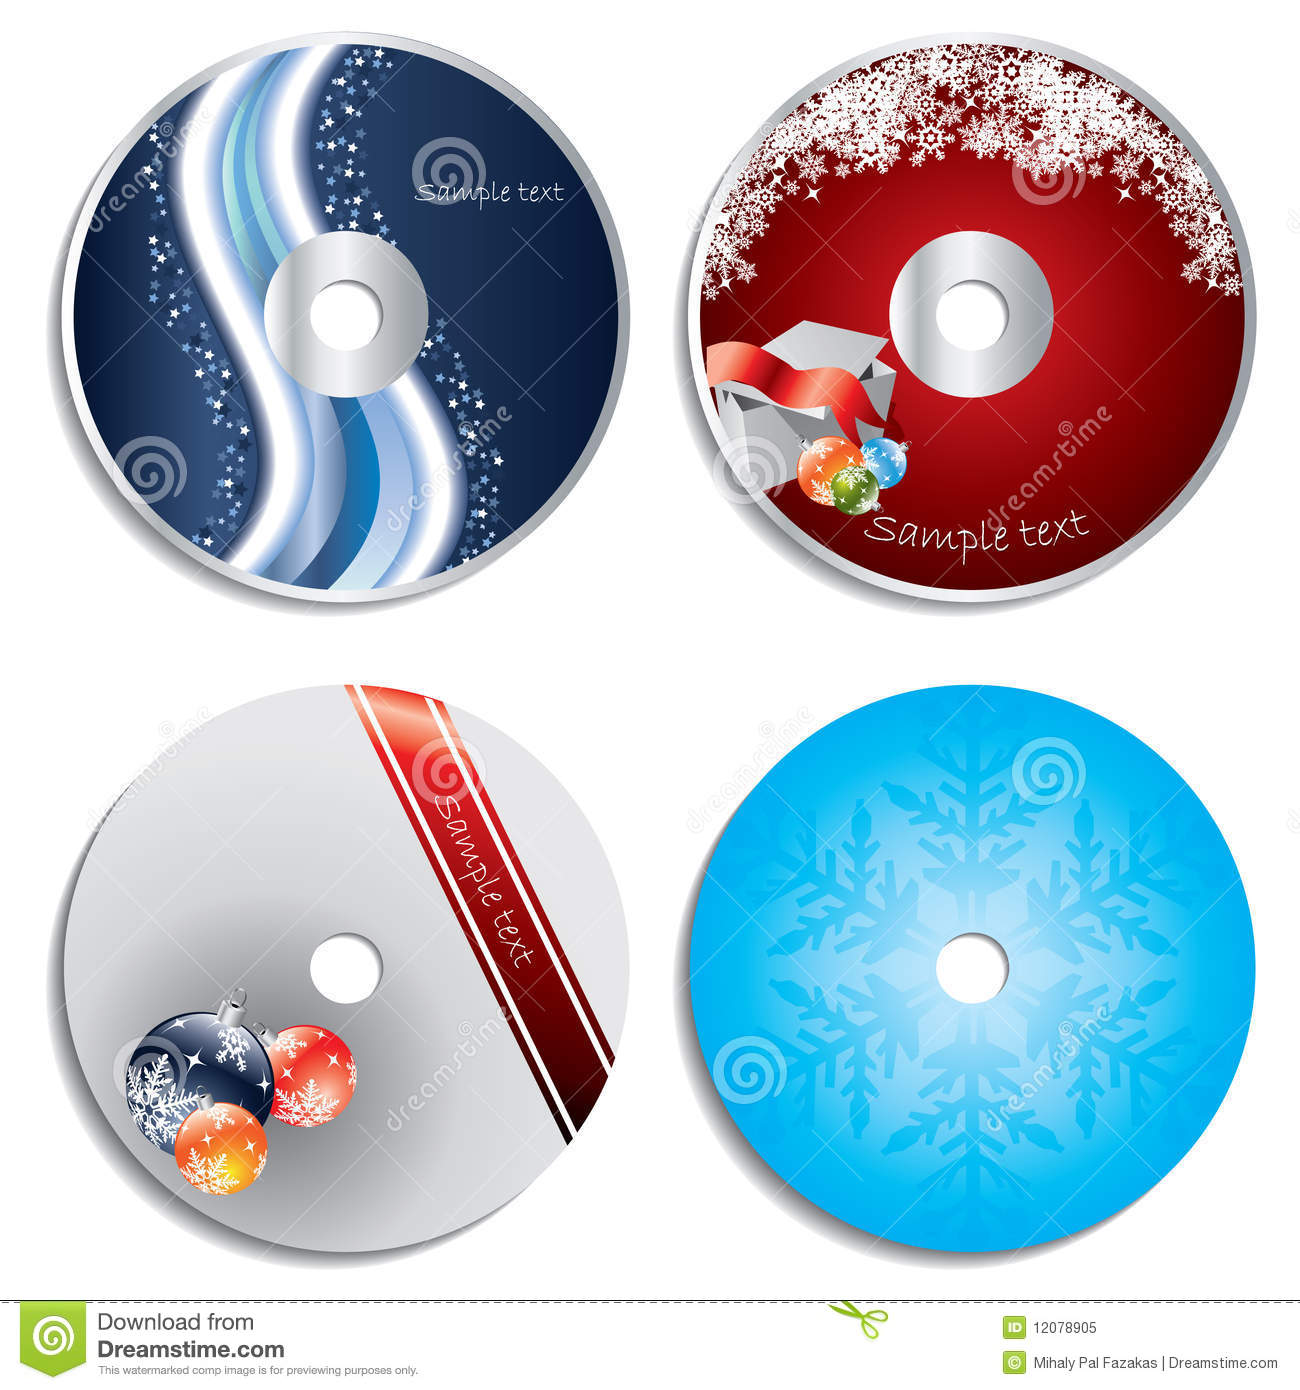 Free CD Label Designs Christmas